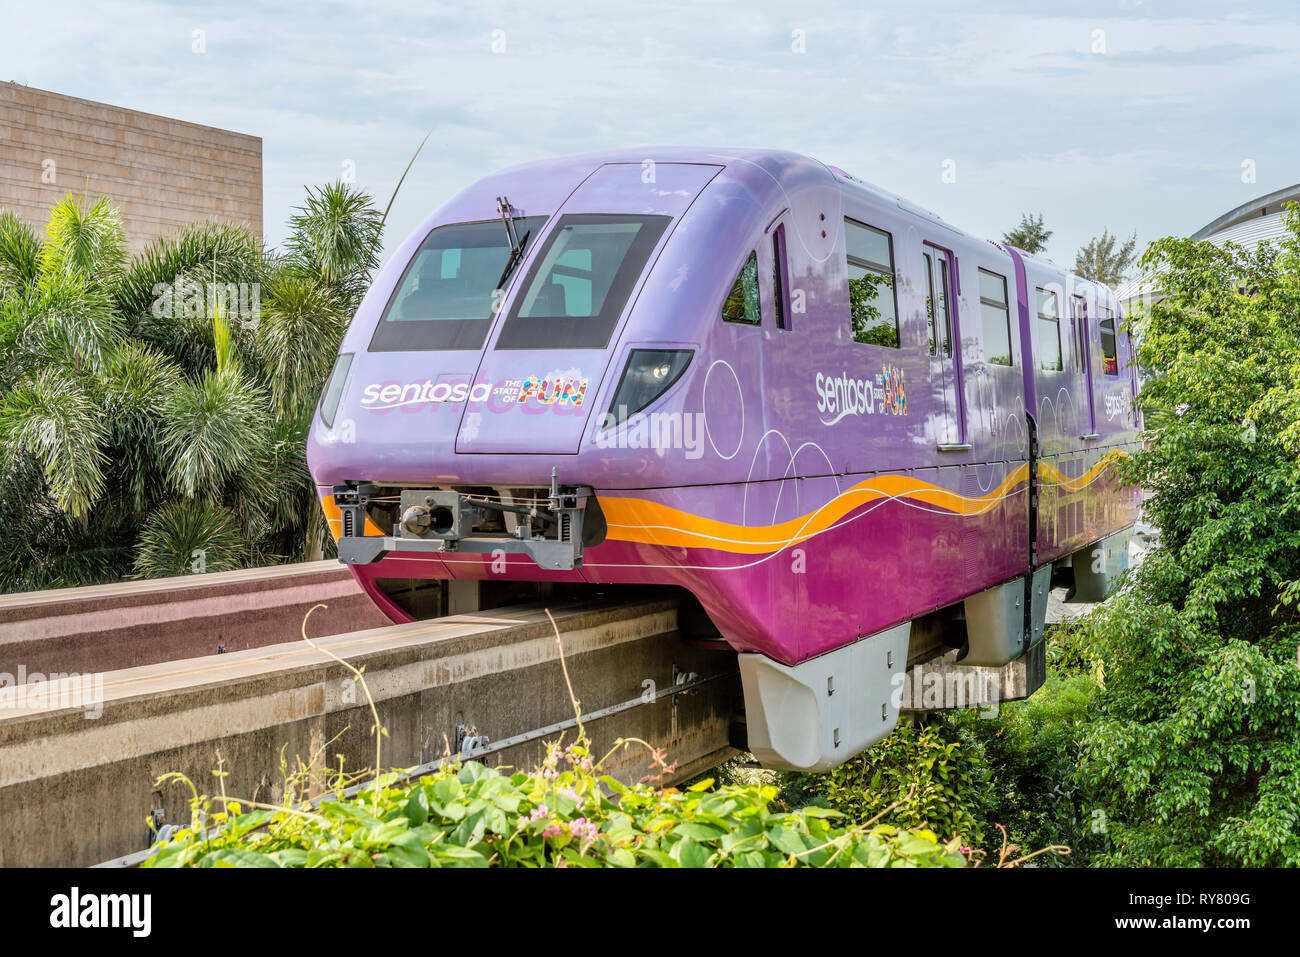 Sentosa Express Island Monorail train, Singapore |  Sentosa Express Island Monorail Zug, Singapur - Stock Image